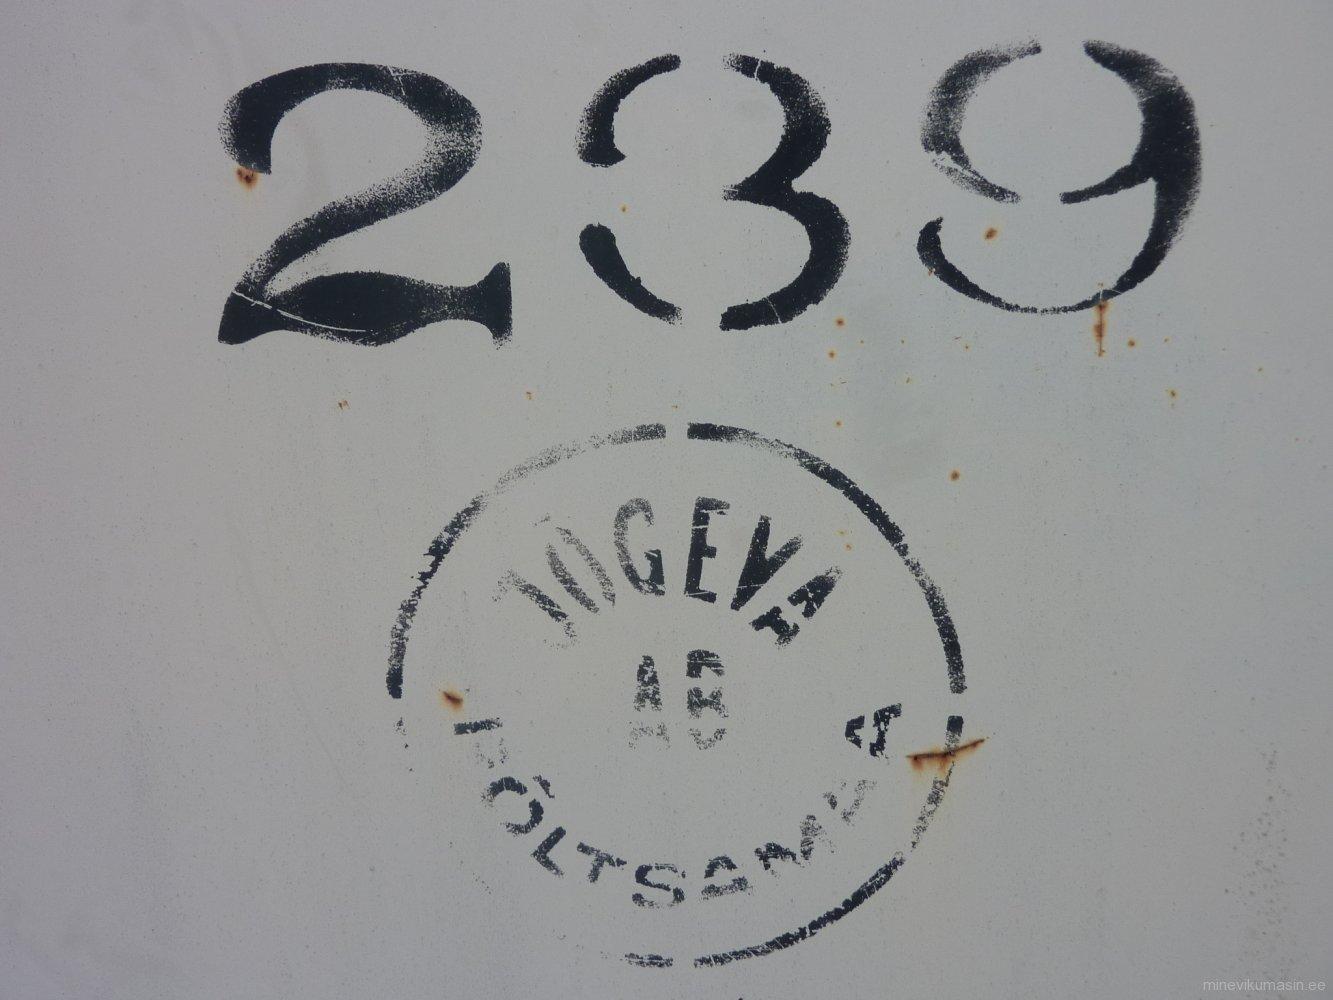 01.09.2010